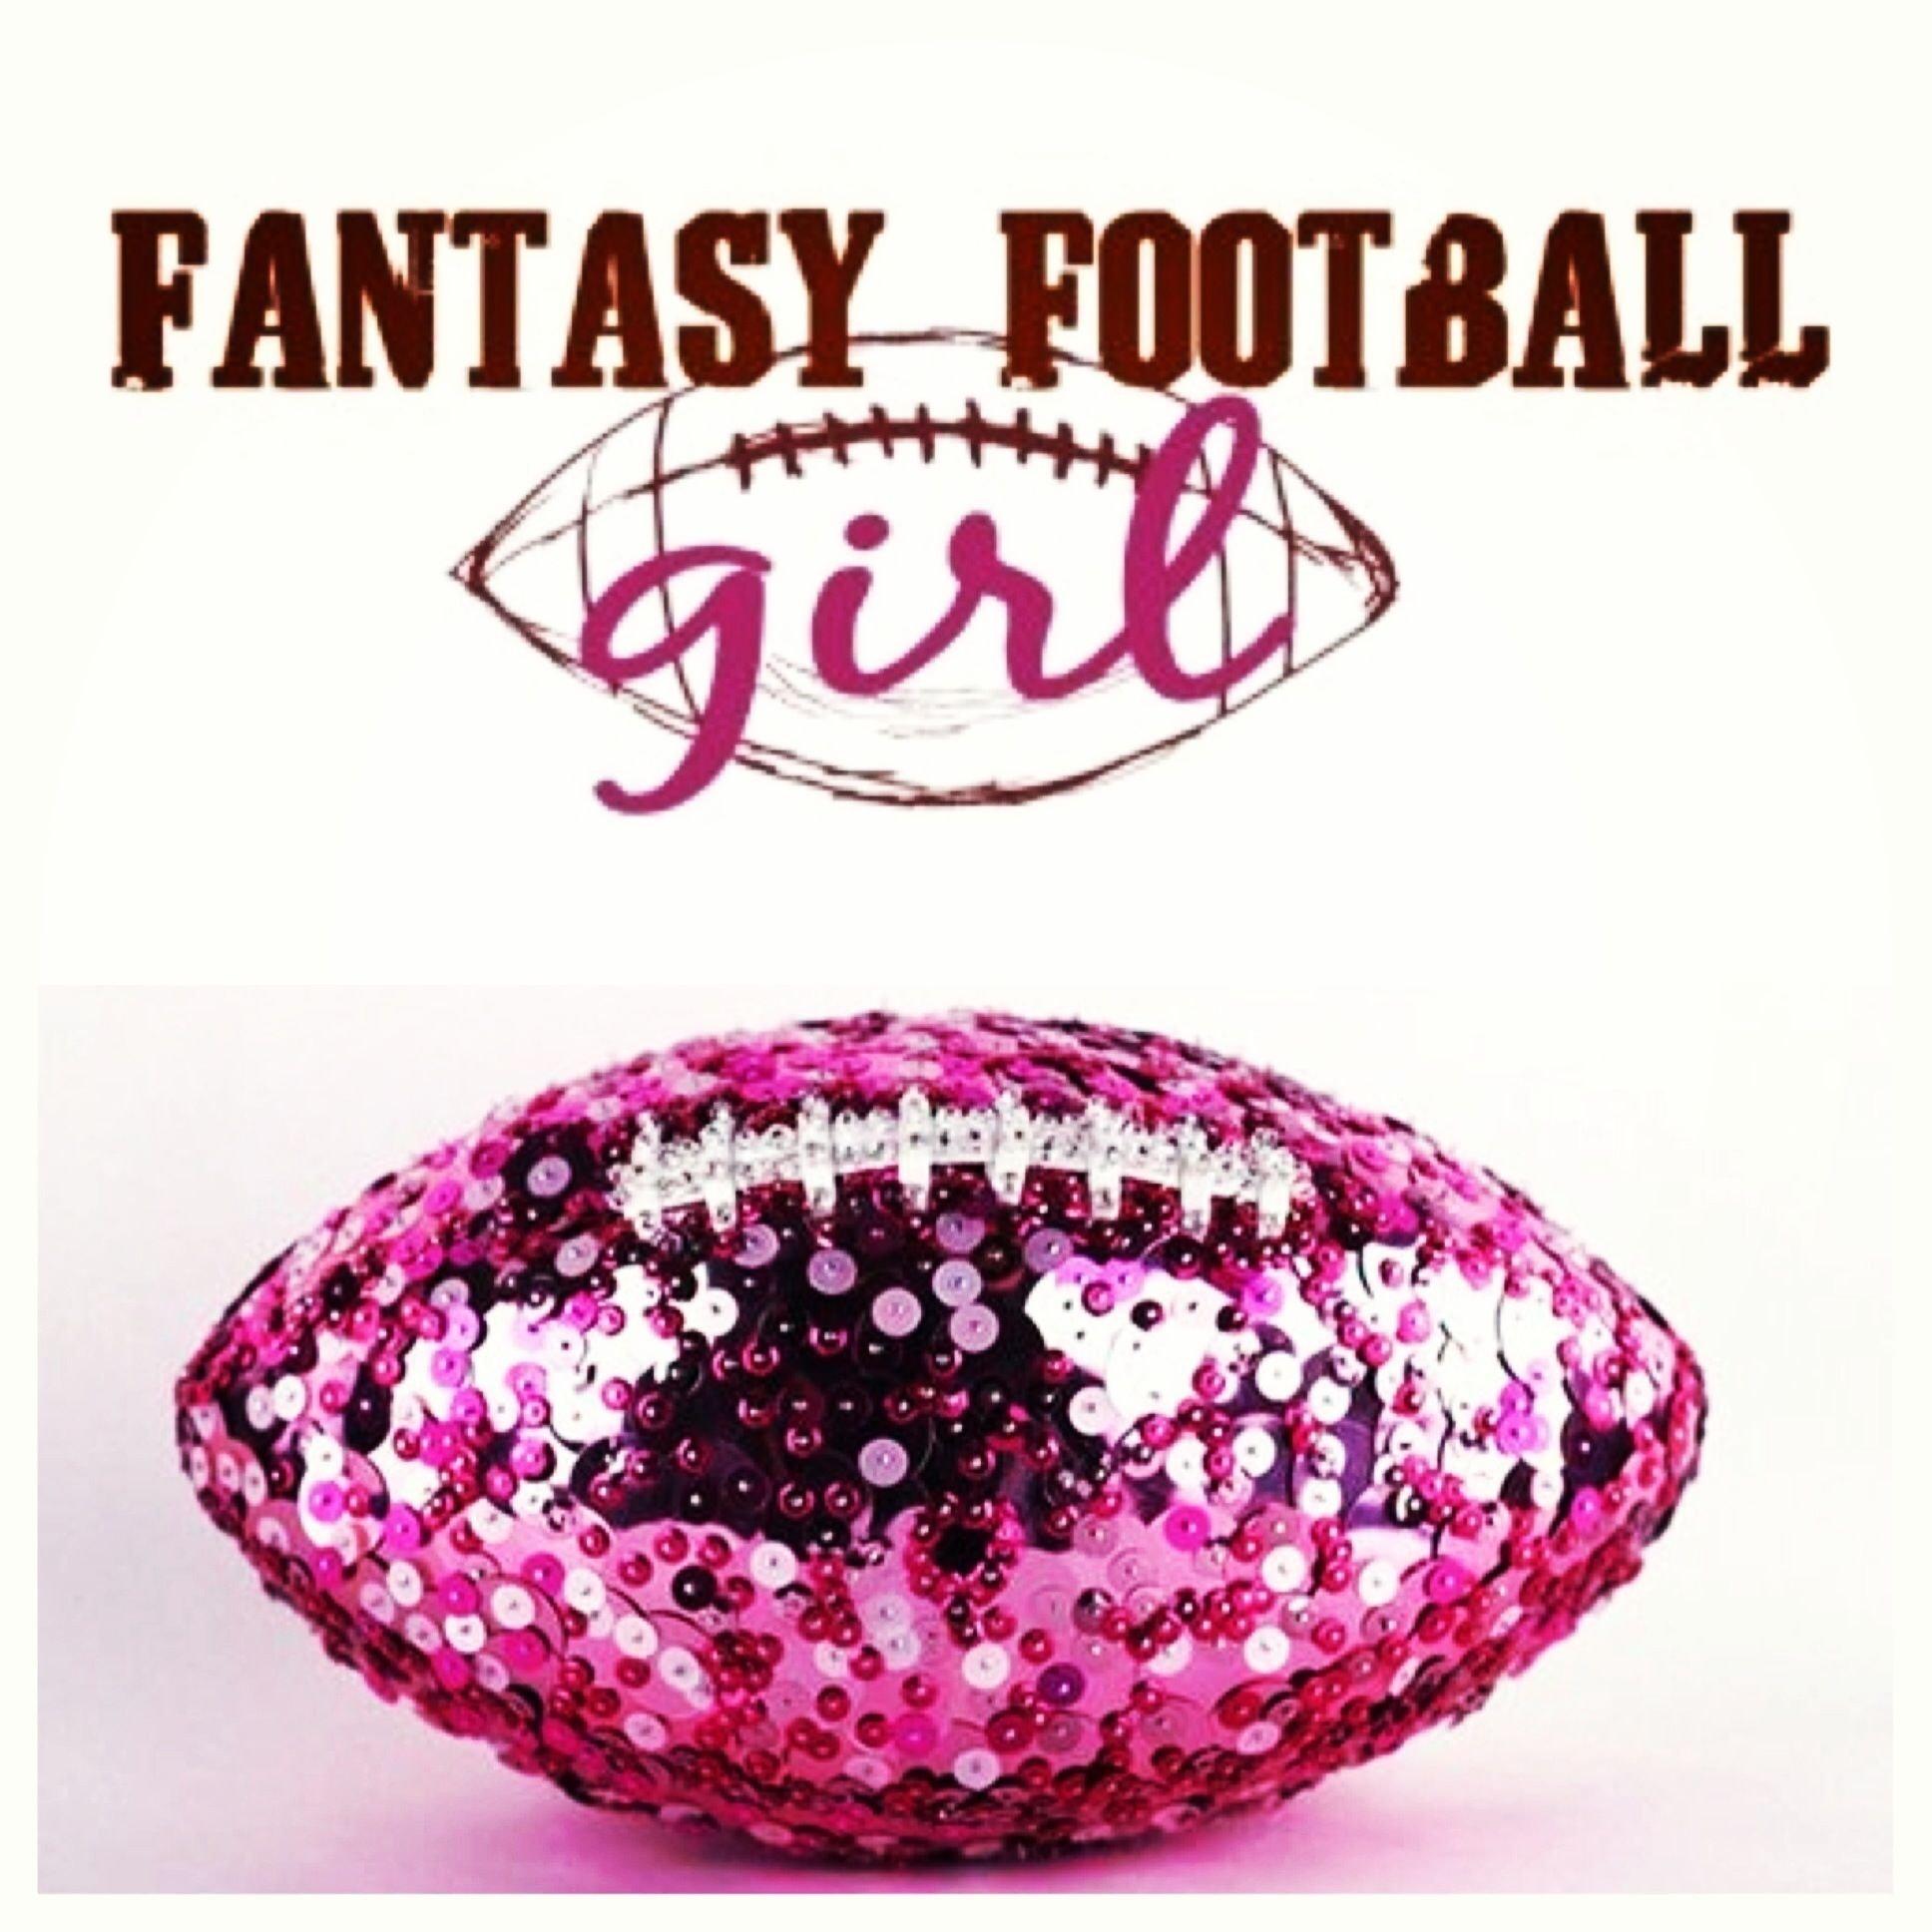 10 Unique Fantasy Football League Name Ideas fantasy football all girls league team trophy wife pinteres 2020